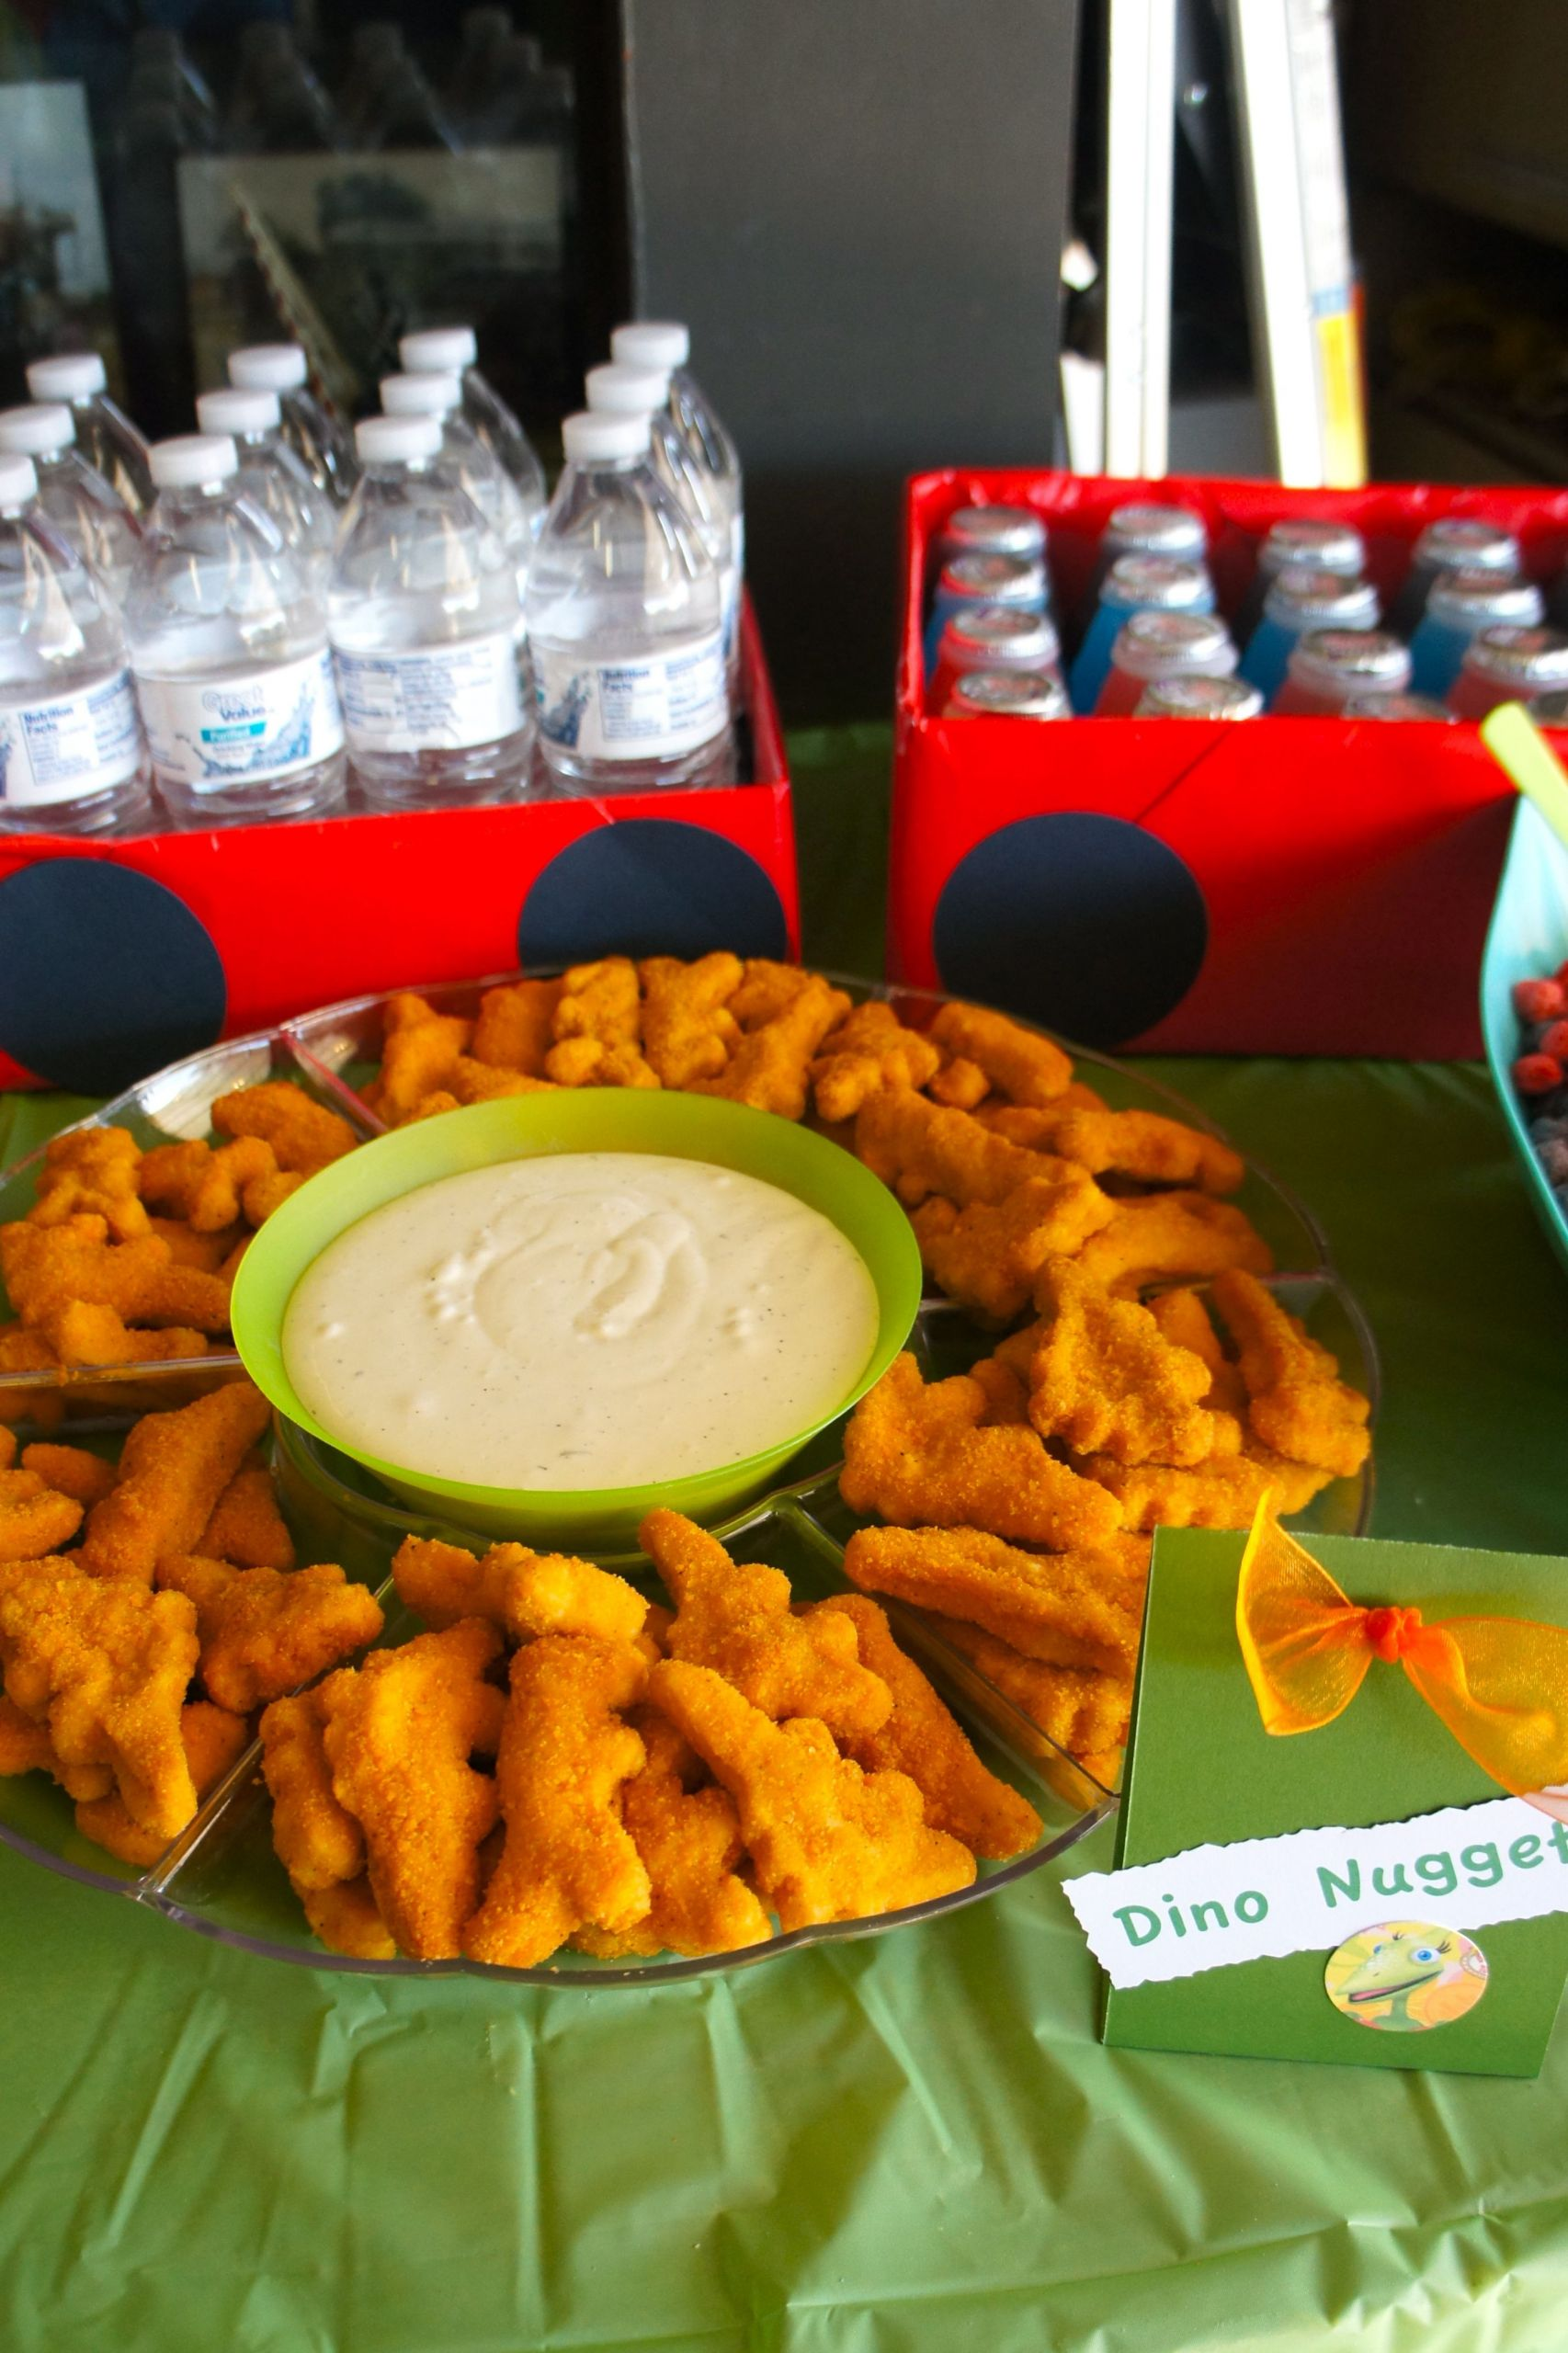 Dinosaur Food Ideas For Birthday Party  Dinosaur Train Birthday Party Food